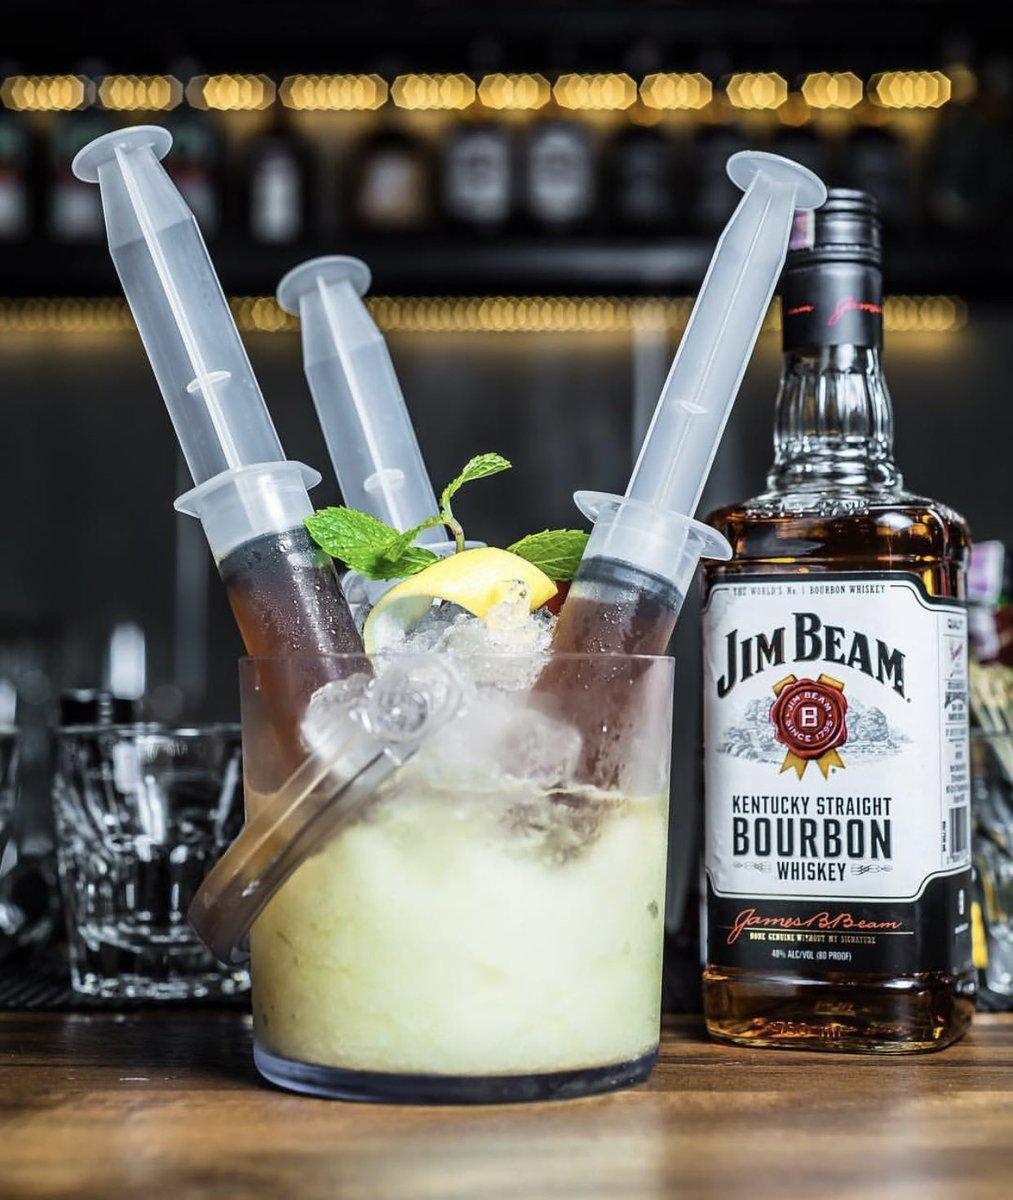 Kalau mau chill lagi, di lantai dua kita punya bar yang bebas merokok, ada signature cocktails juga